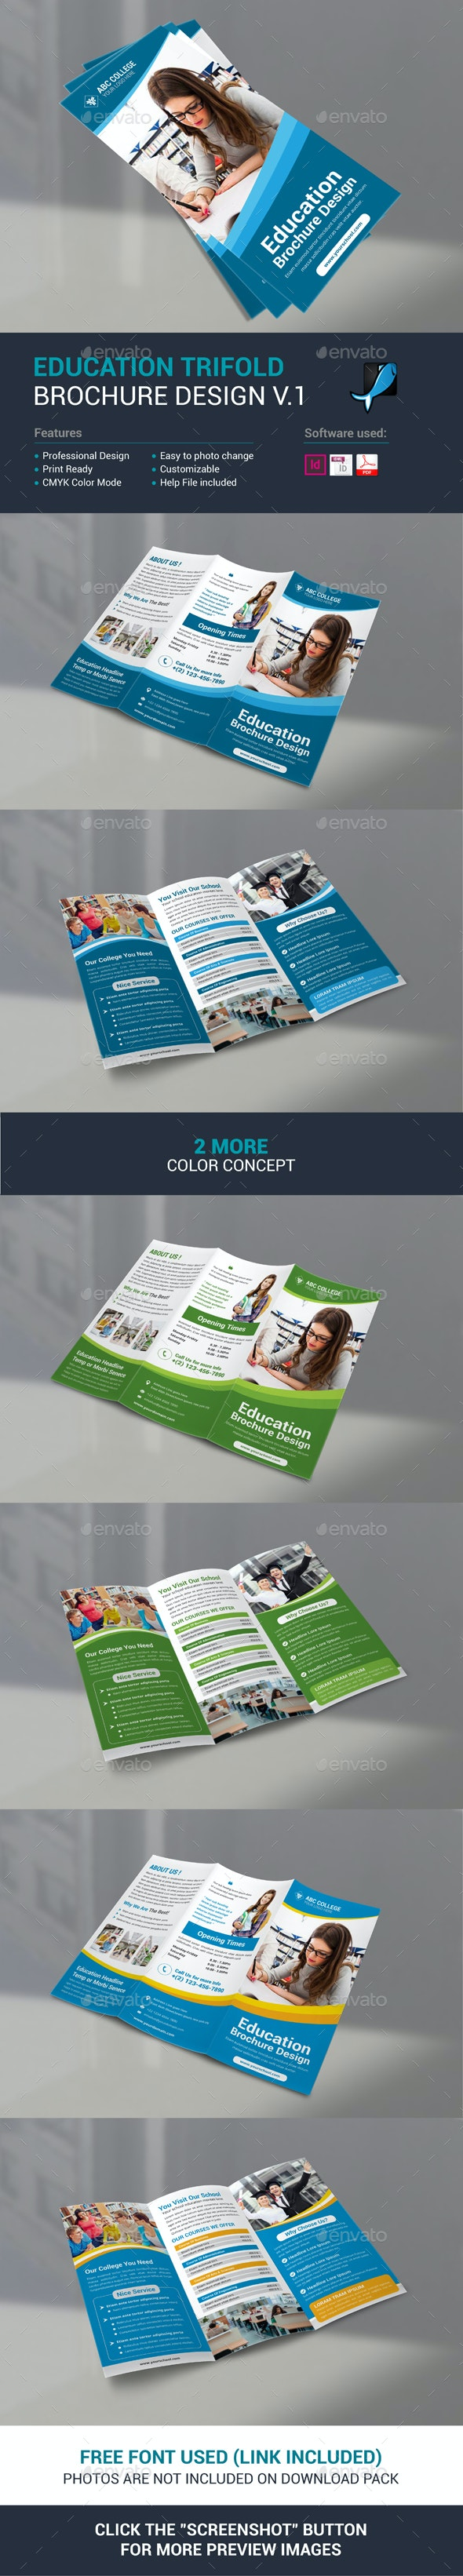 Education Trifold Brochure - Corporate Brochures